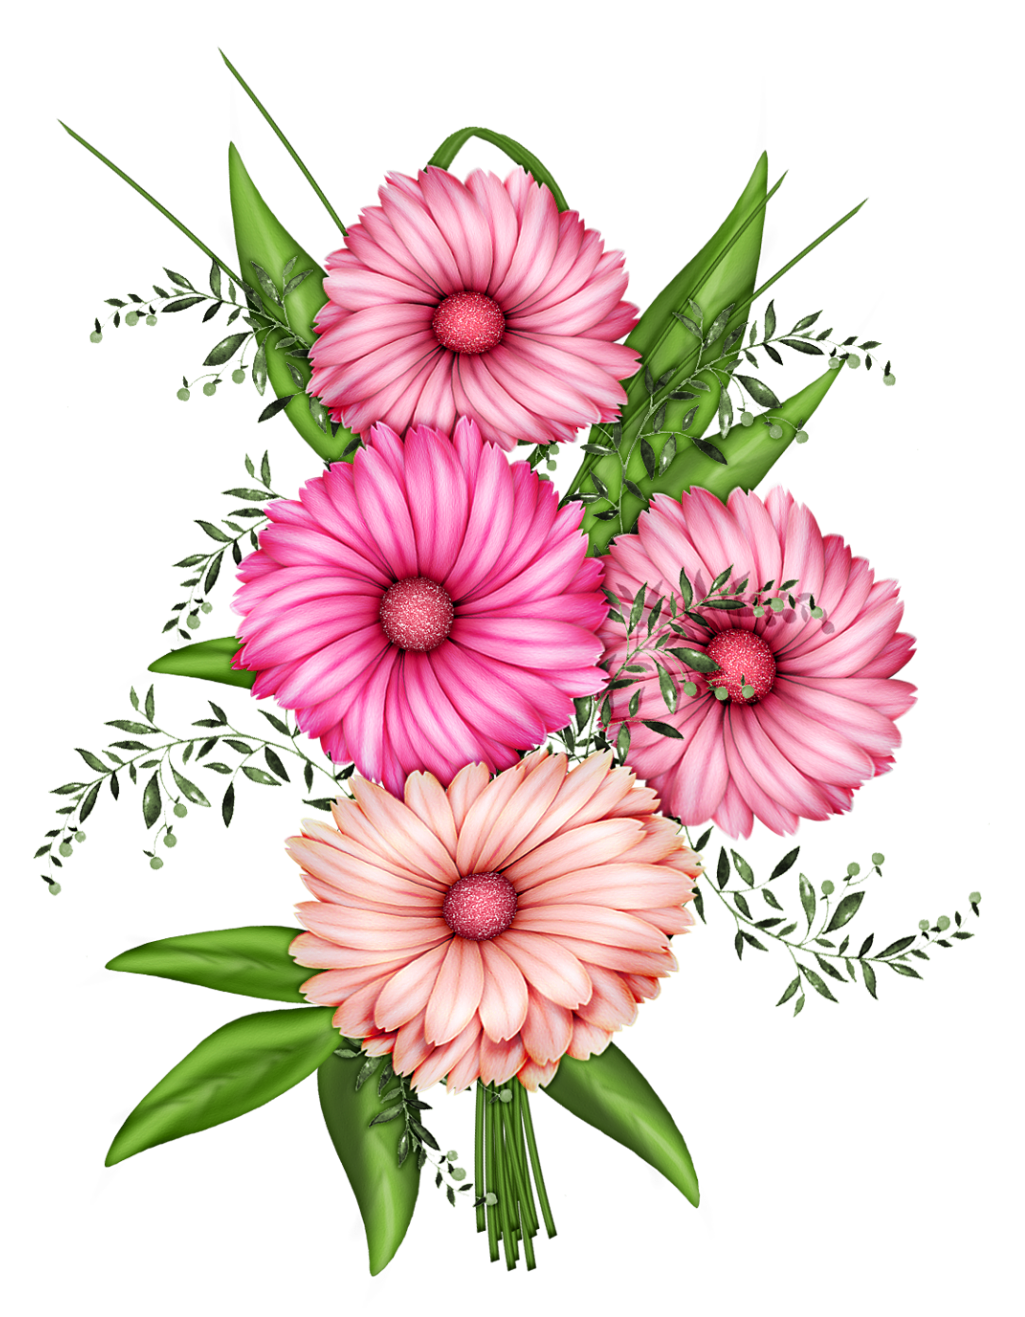 flower images flower photos flowers nature purple flowers beautiful flowers paper [ 1025 x 1317 Pixel ]